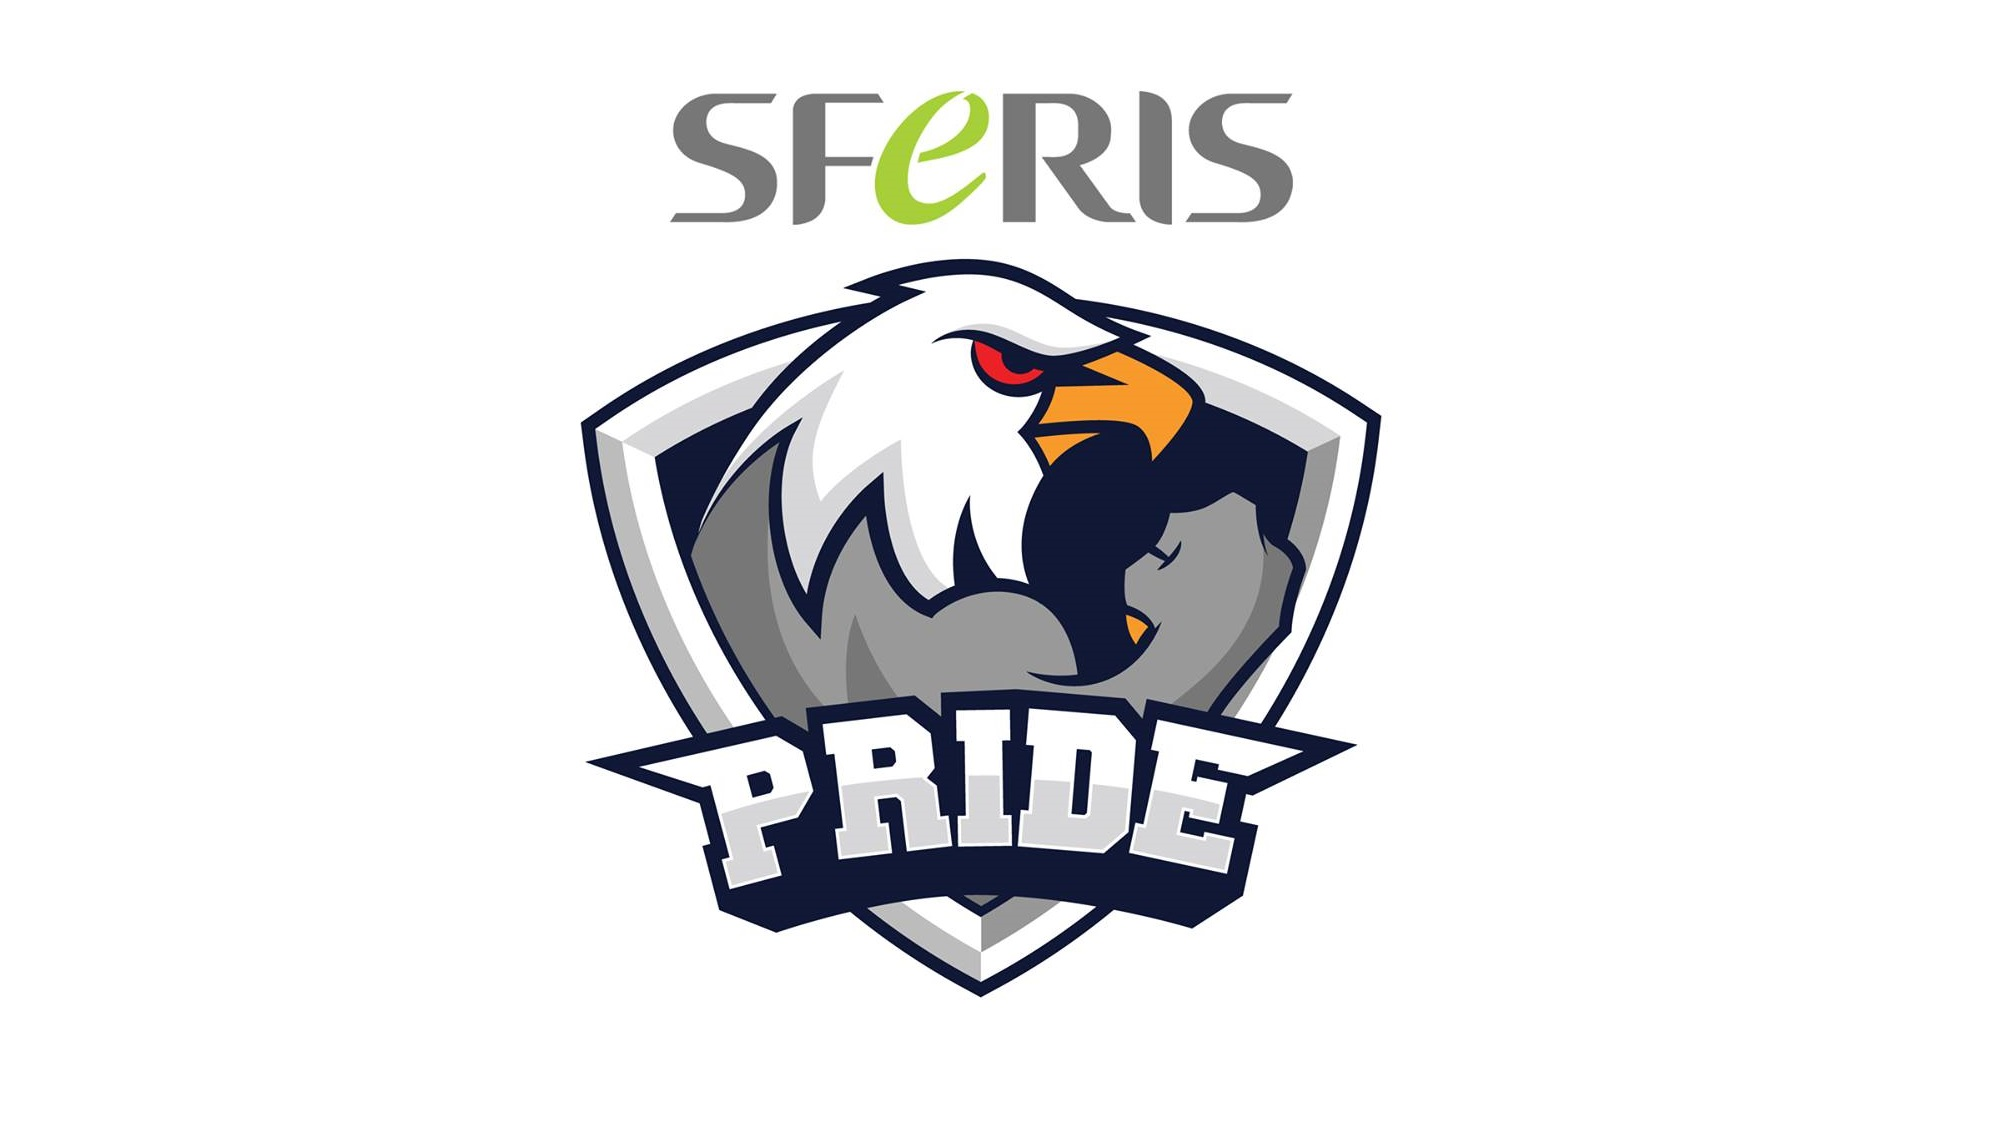 https://inetkox.pl/wp-content/uploads/2017/01/Pride1.jpg